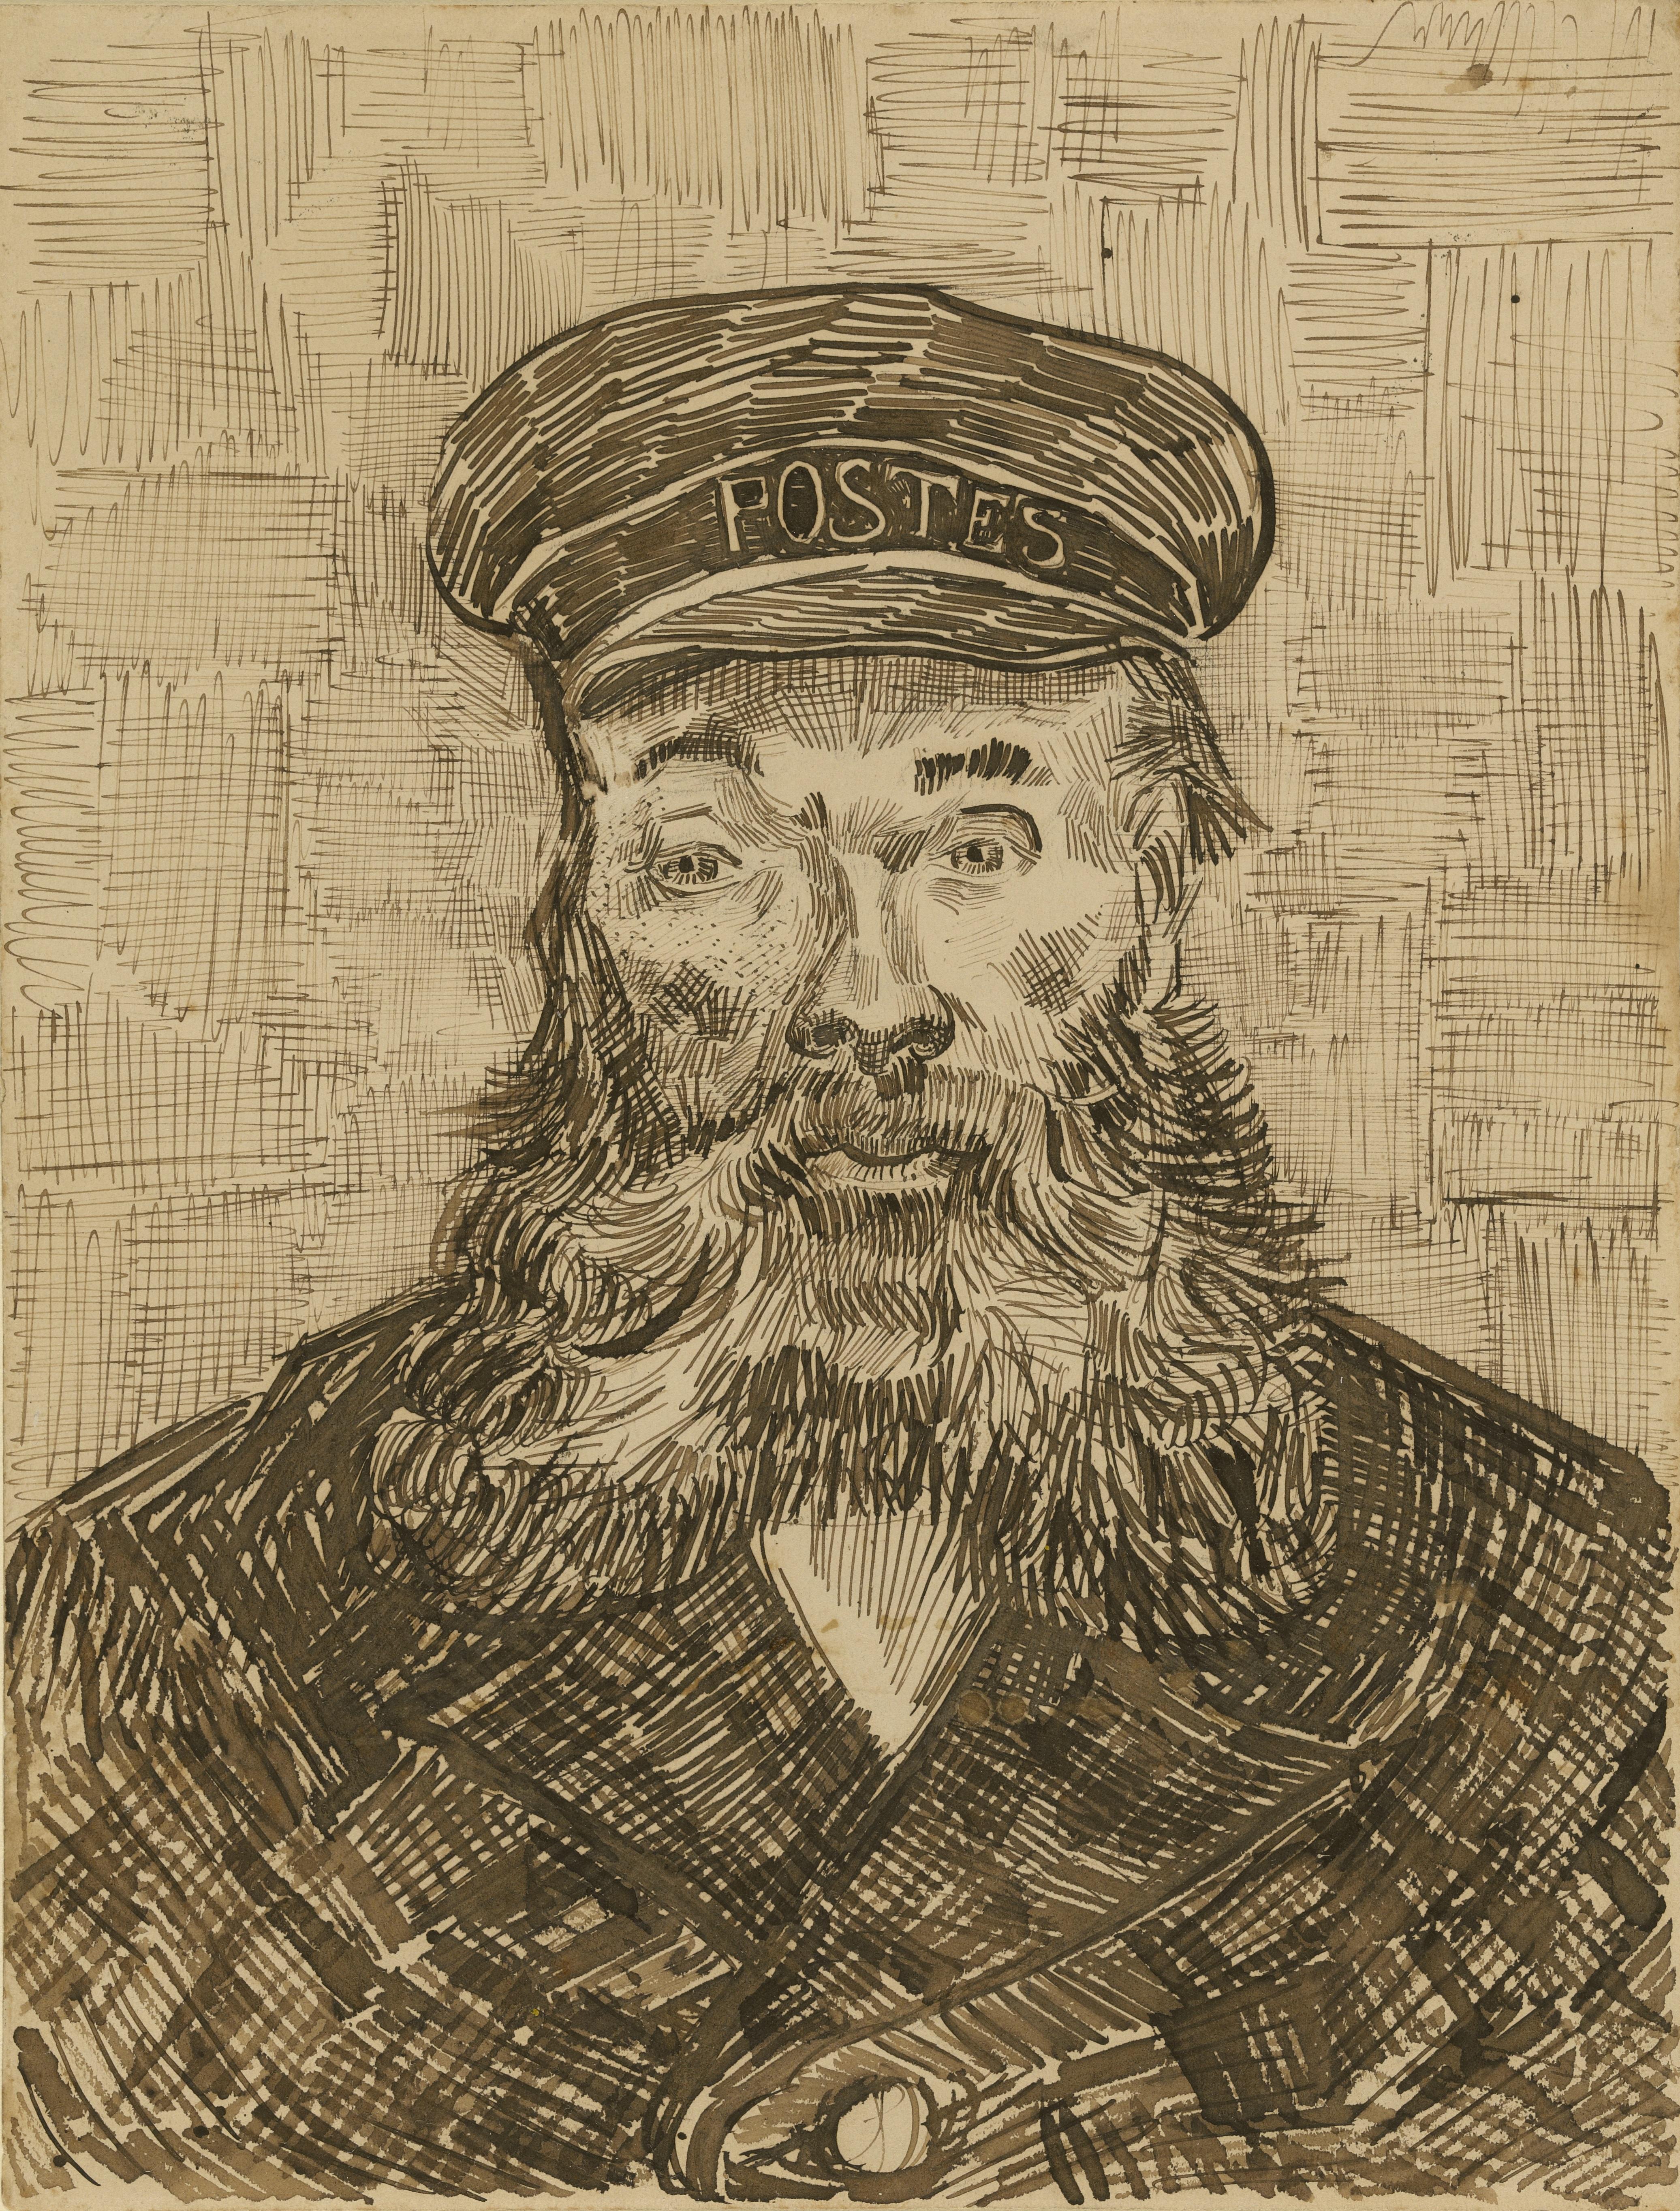 Line Drawing By Vincent Van Gogh : Van gogh drawing blowing drifting